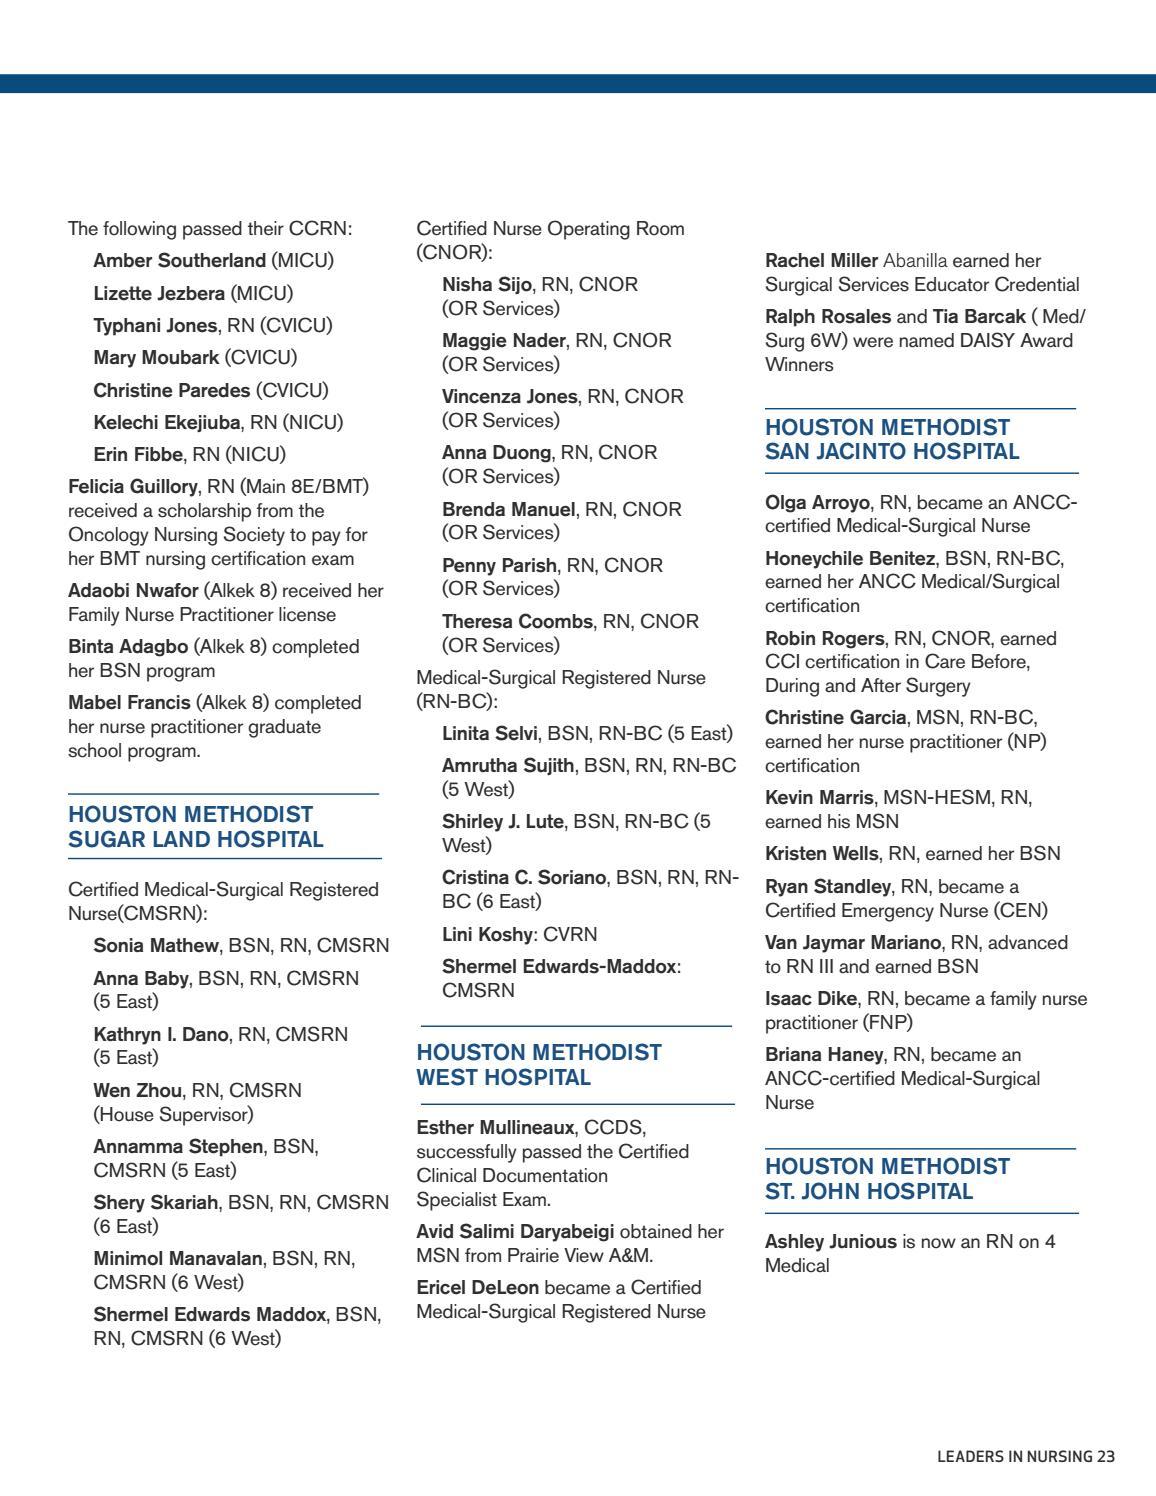 Houston Methodist Nursing Magazine Winter 2016 By Houston Methodist